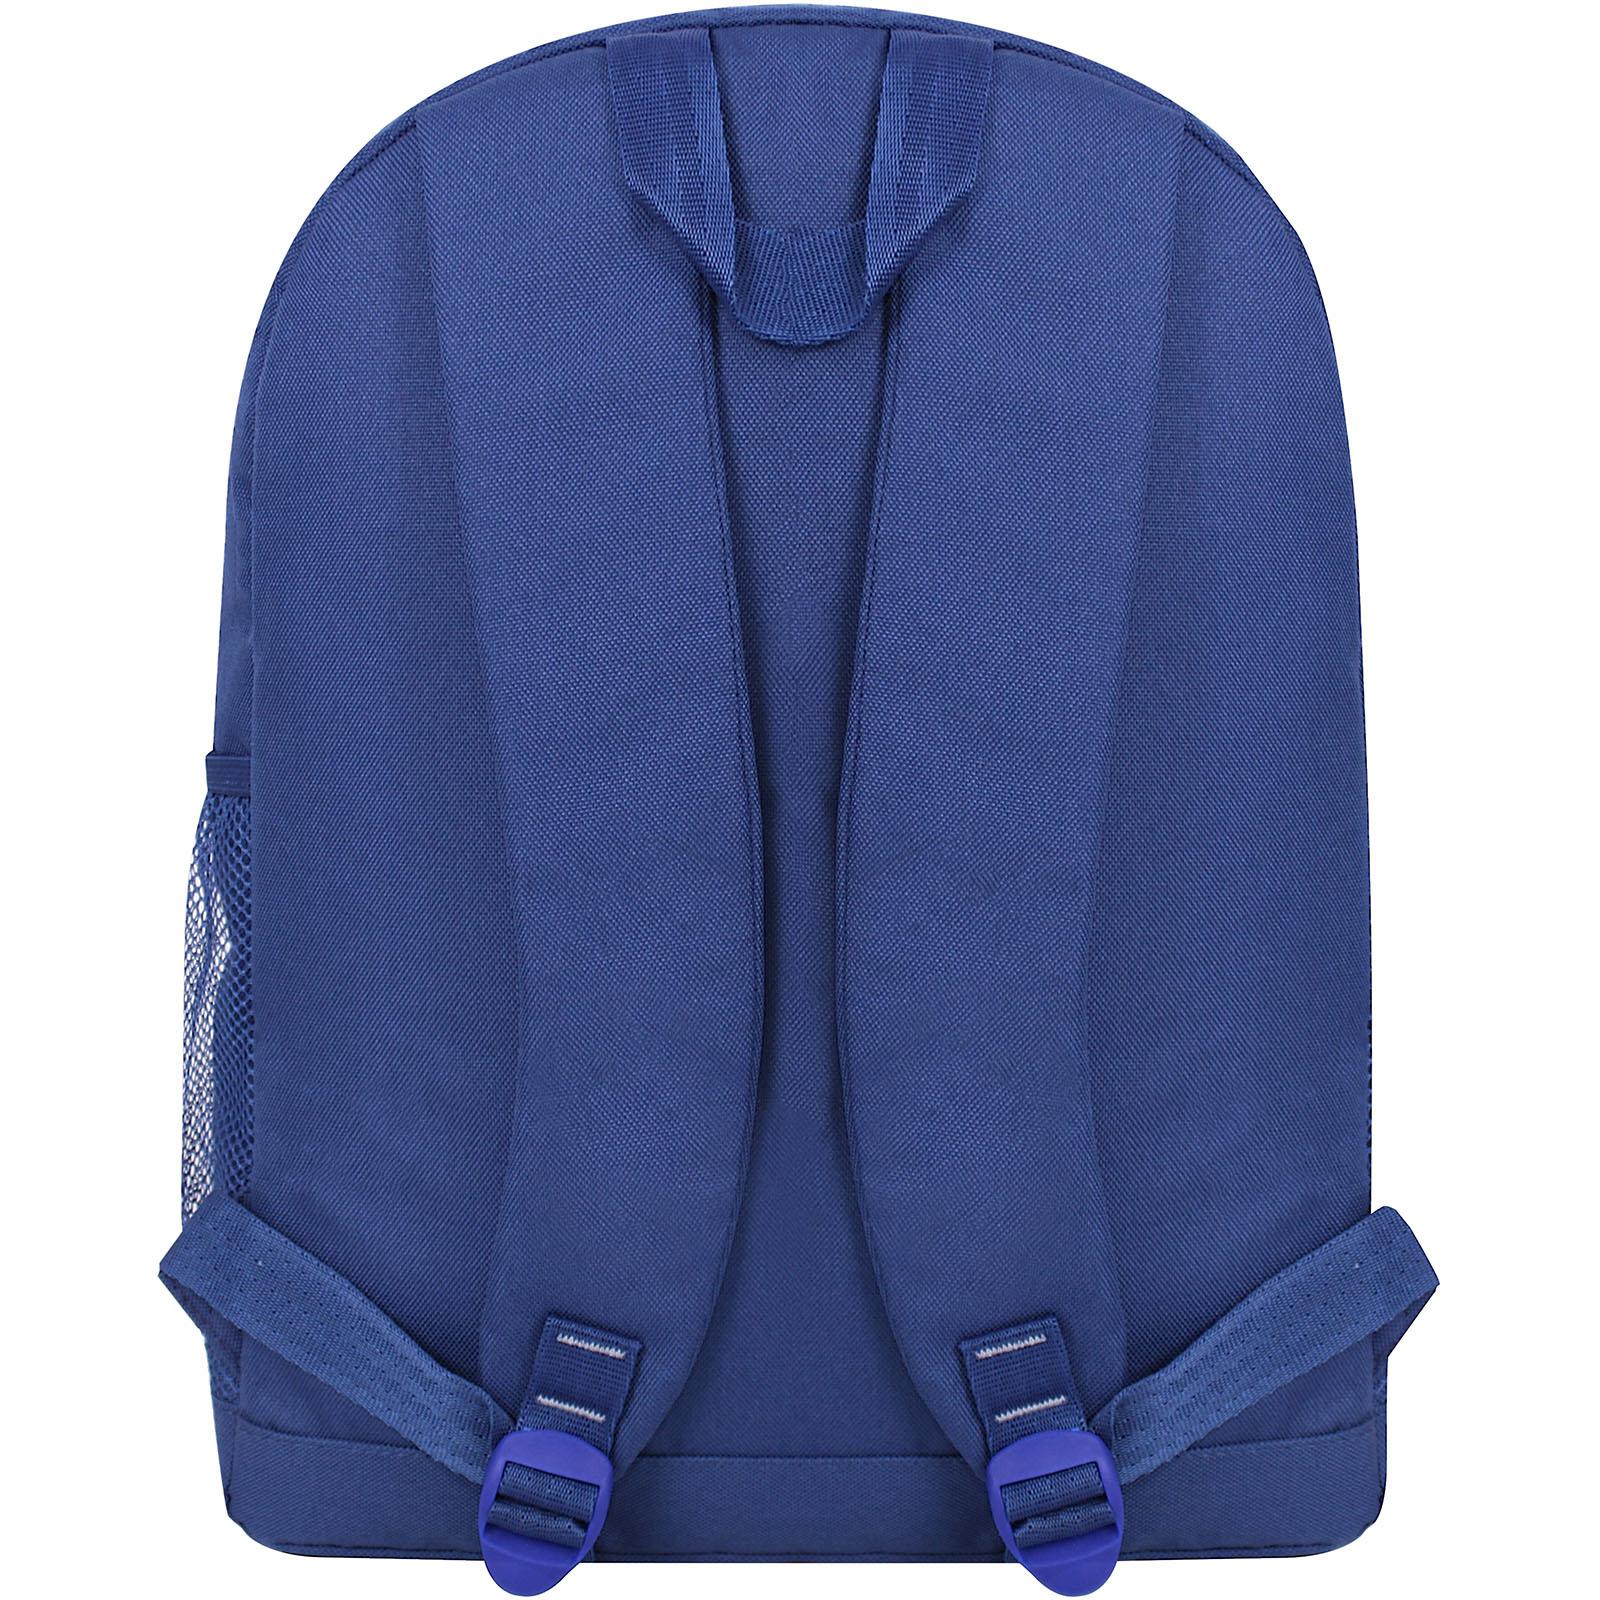 Рюкзак Bagland Молодежный W/R 17 л. Синий 181 (00533662) фото 3